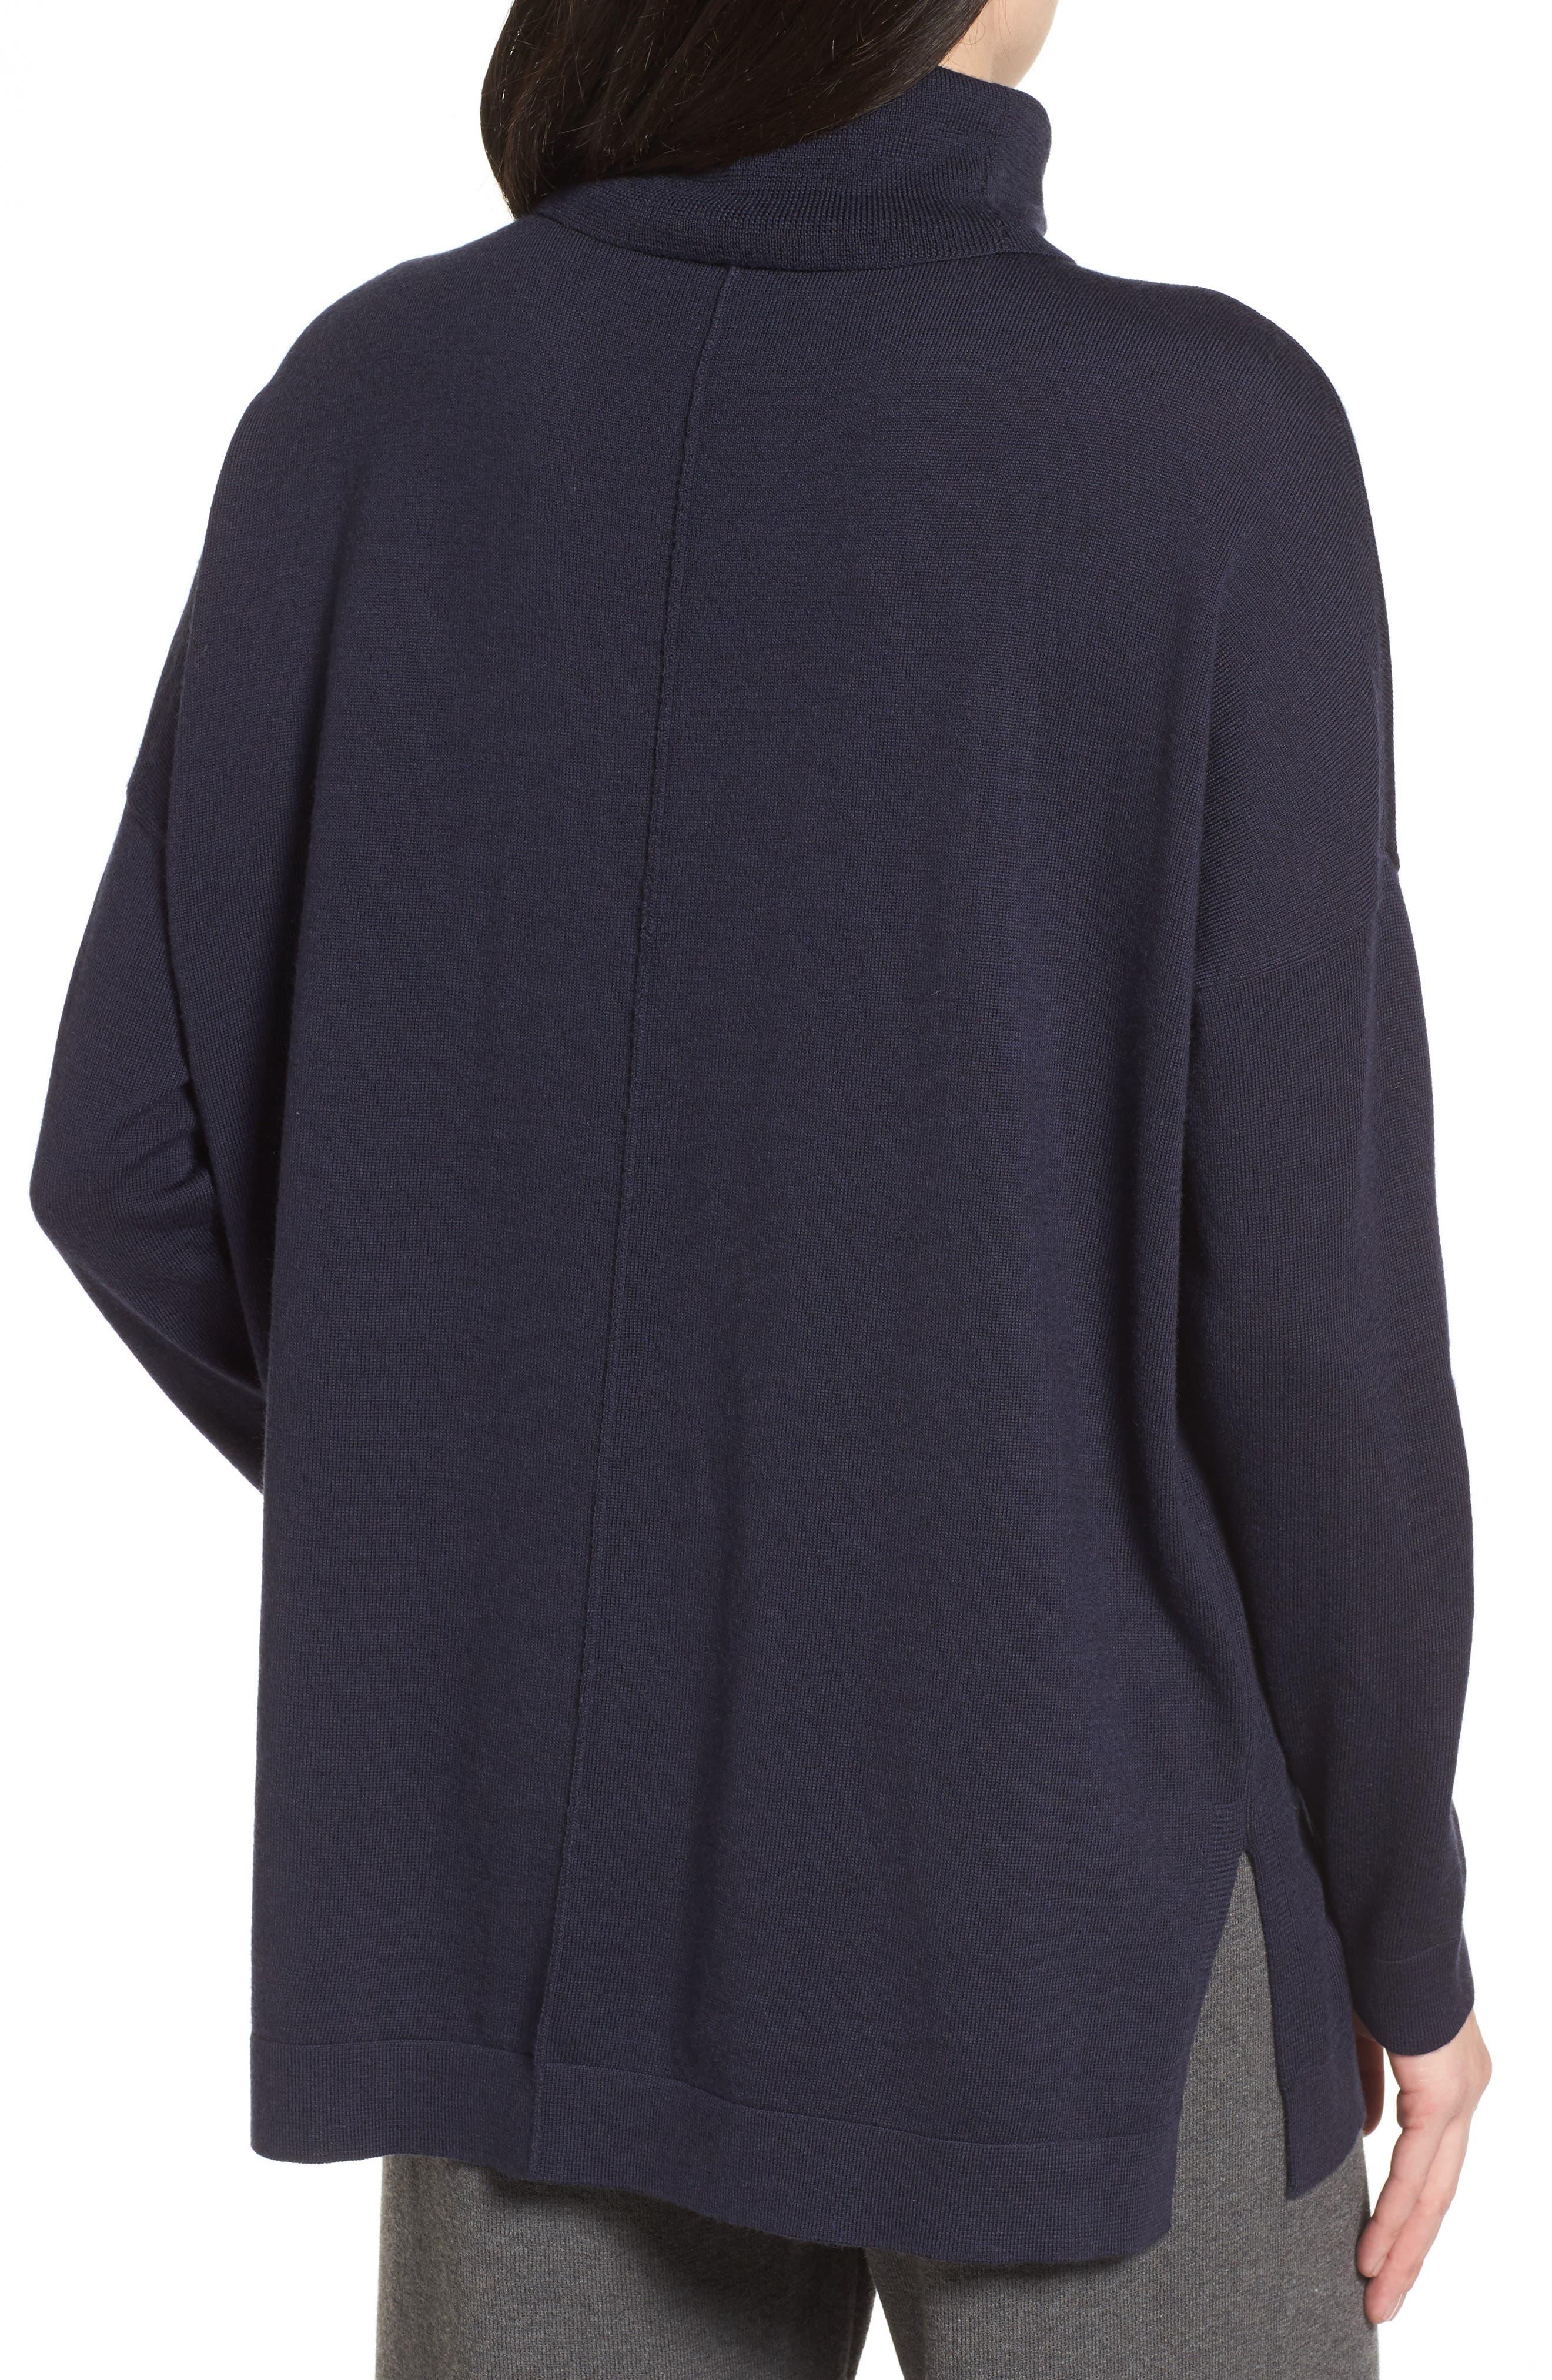 Merino Wool Boxy Turtleneck Sweater,                             Alternate thumbnail 9, color,